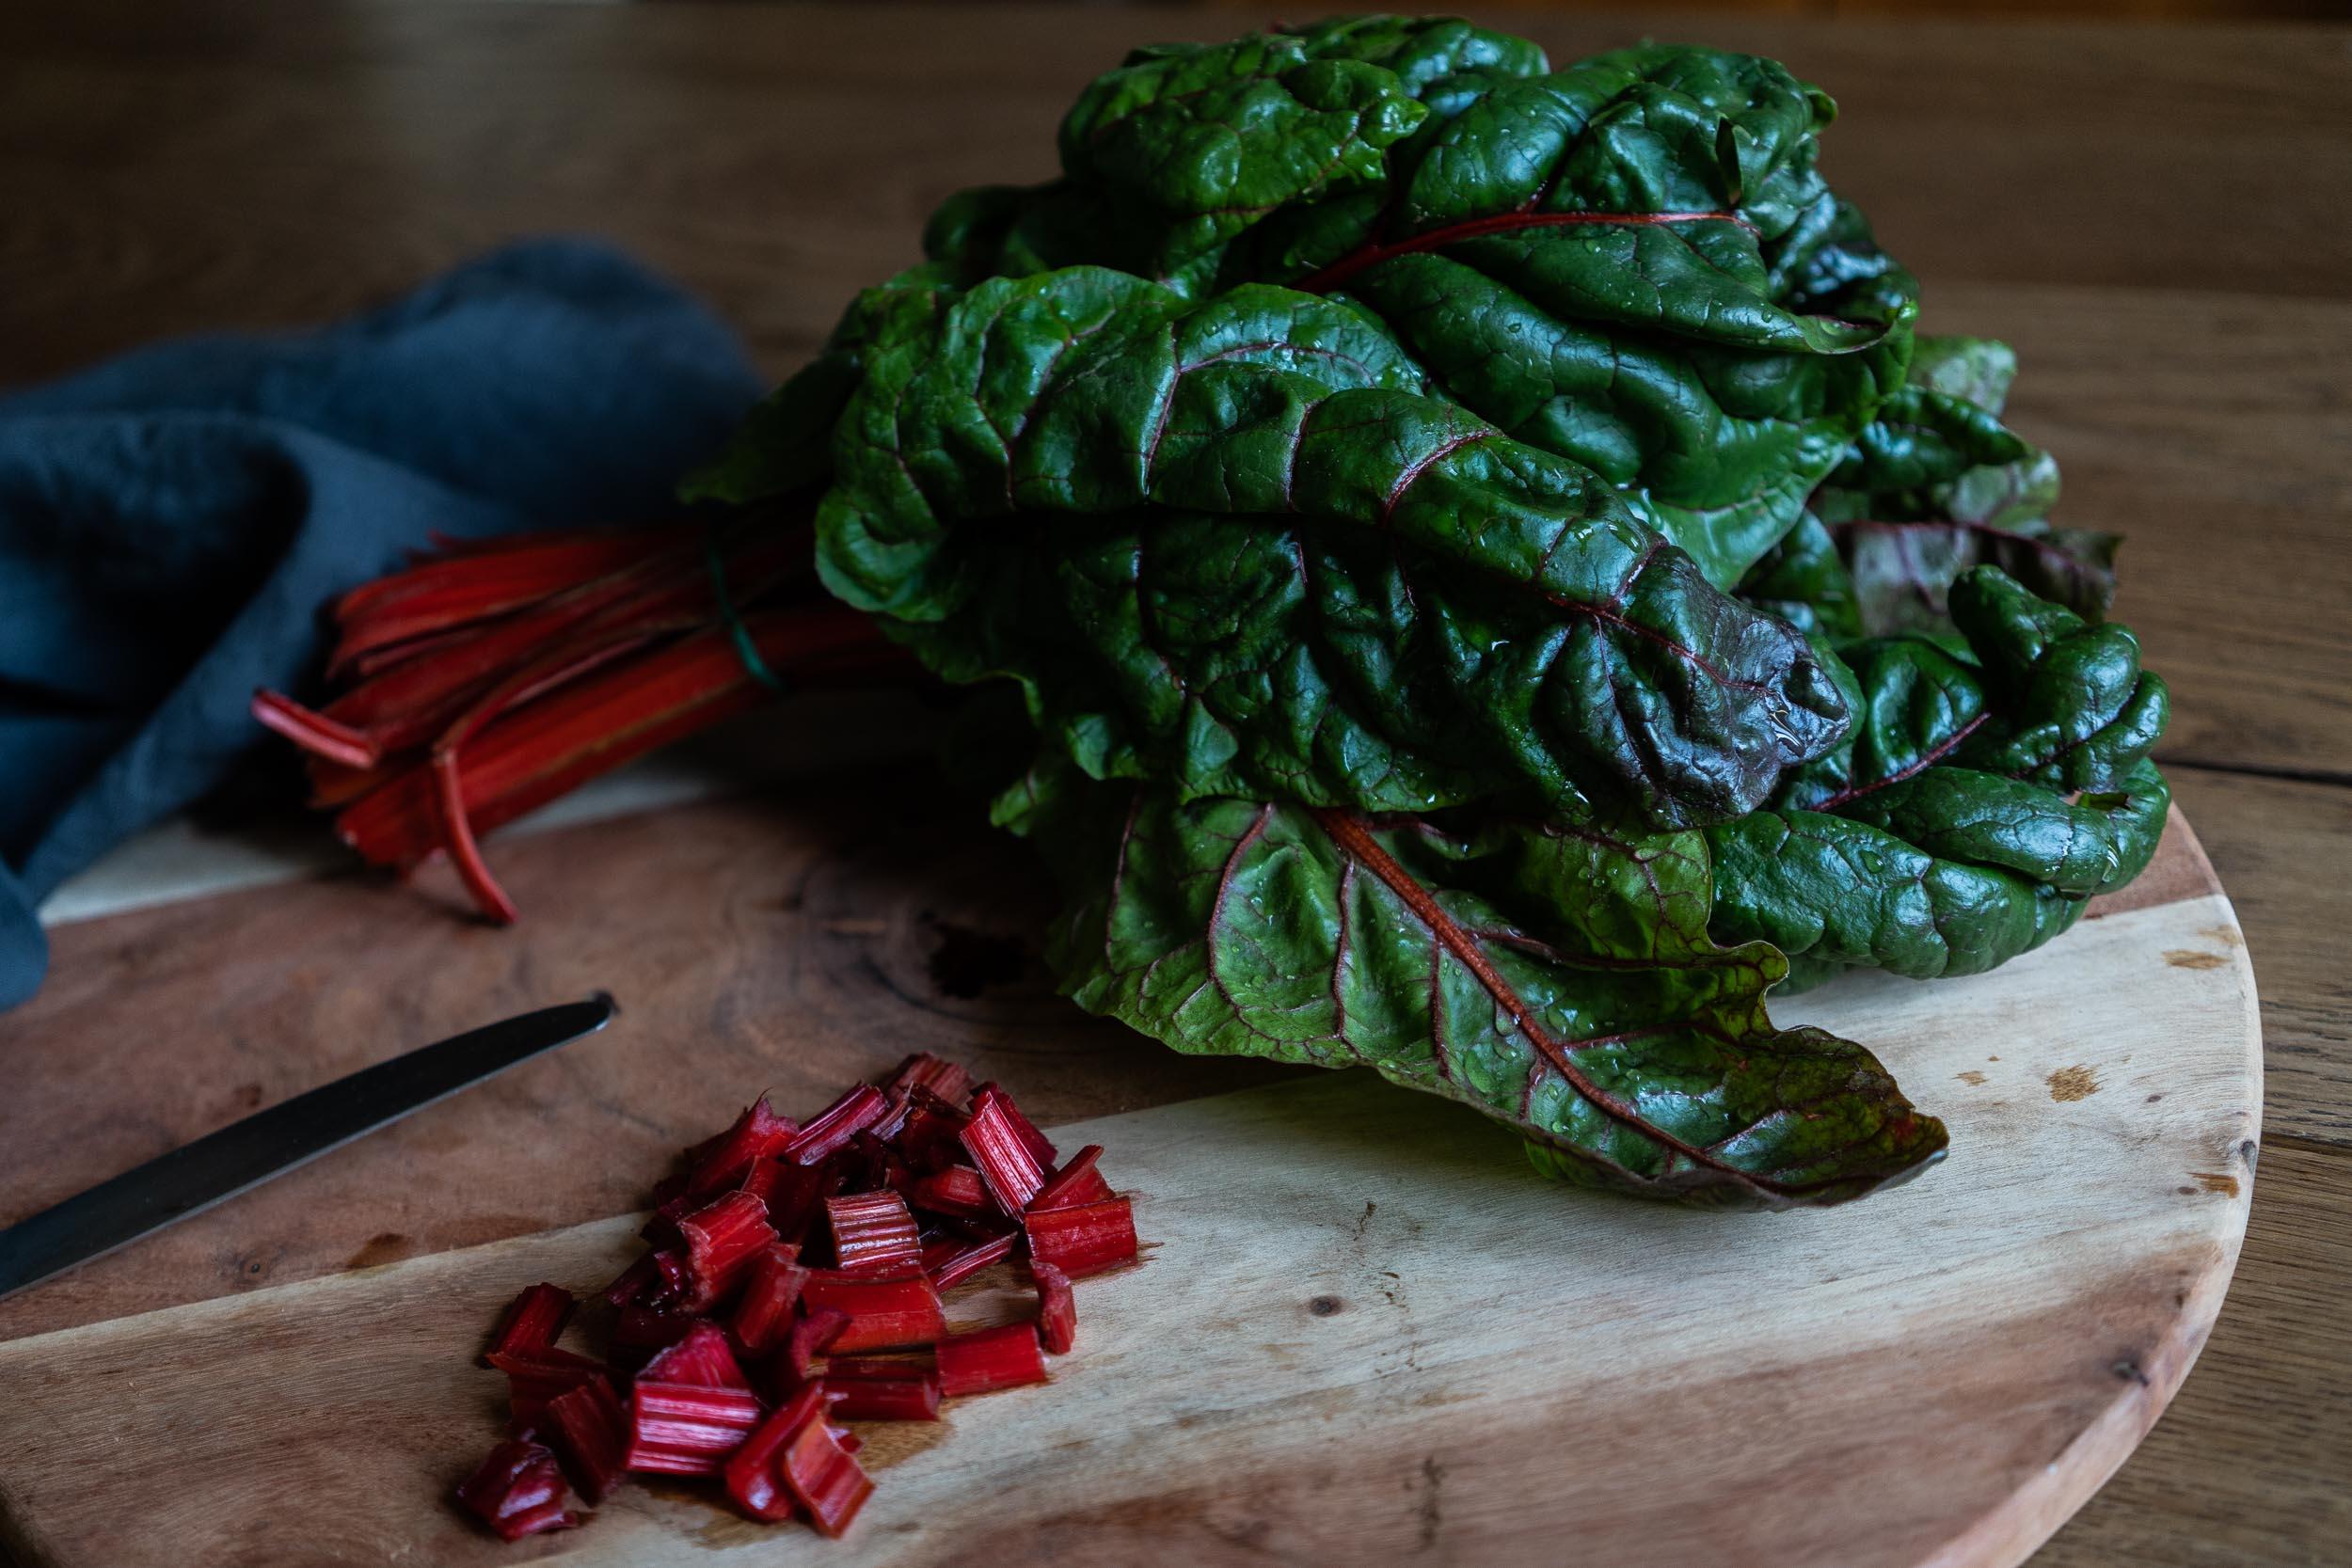 Rhubarb-Jam-with-cardamom-and-ginger-05027.jpg